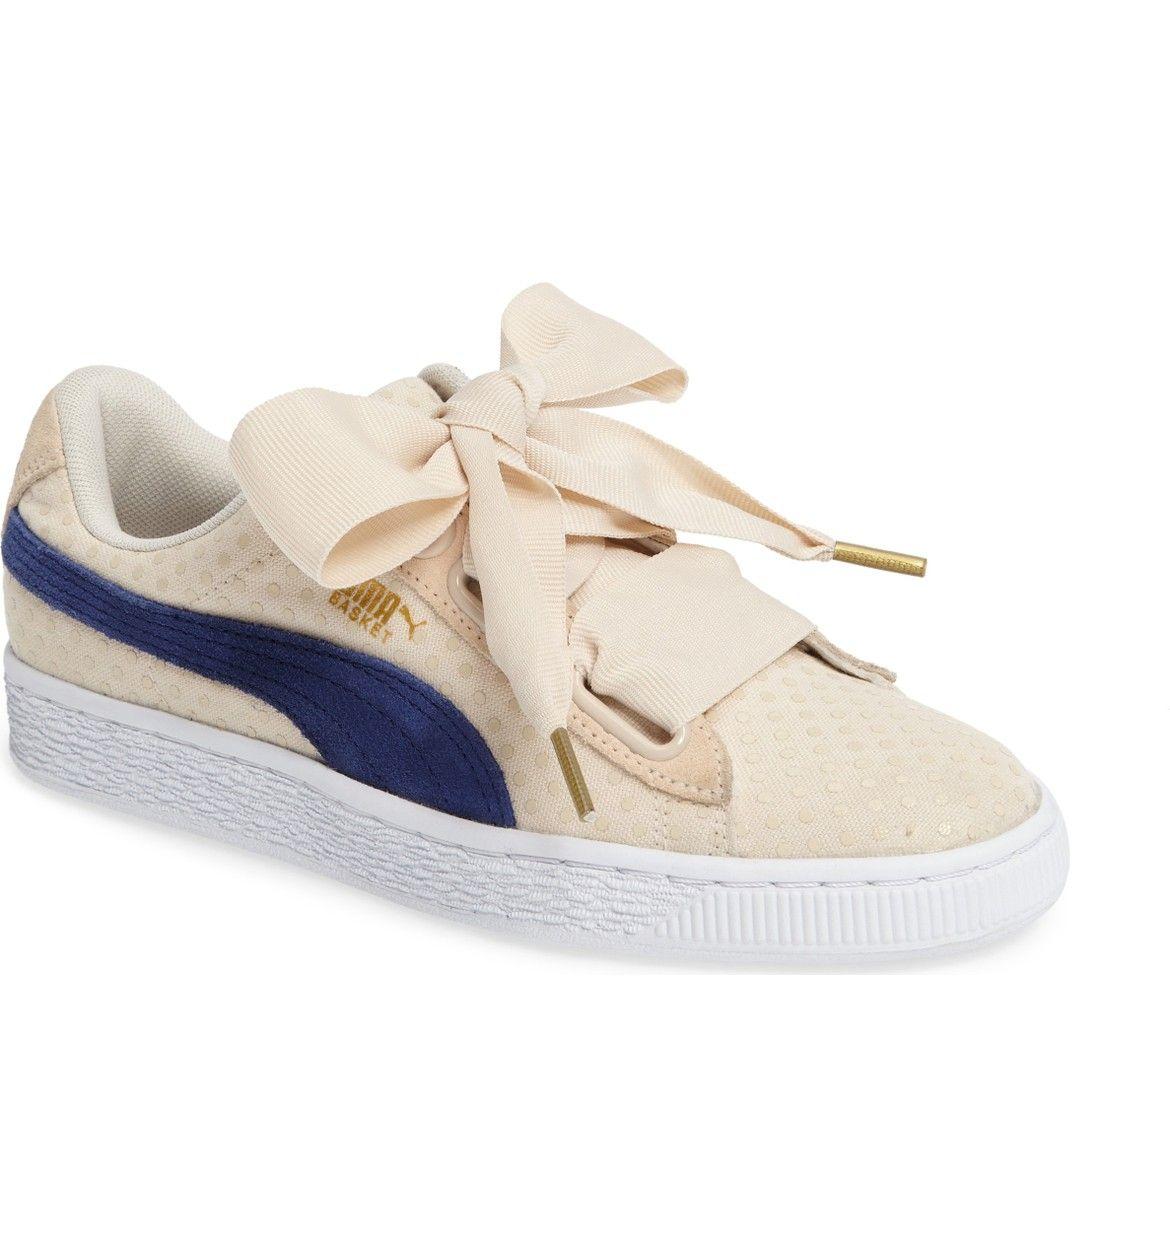 Puma basket heart, Sneakers, Wide sneakers